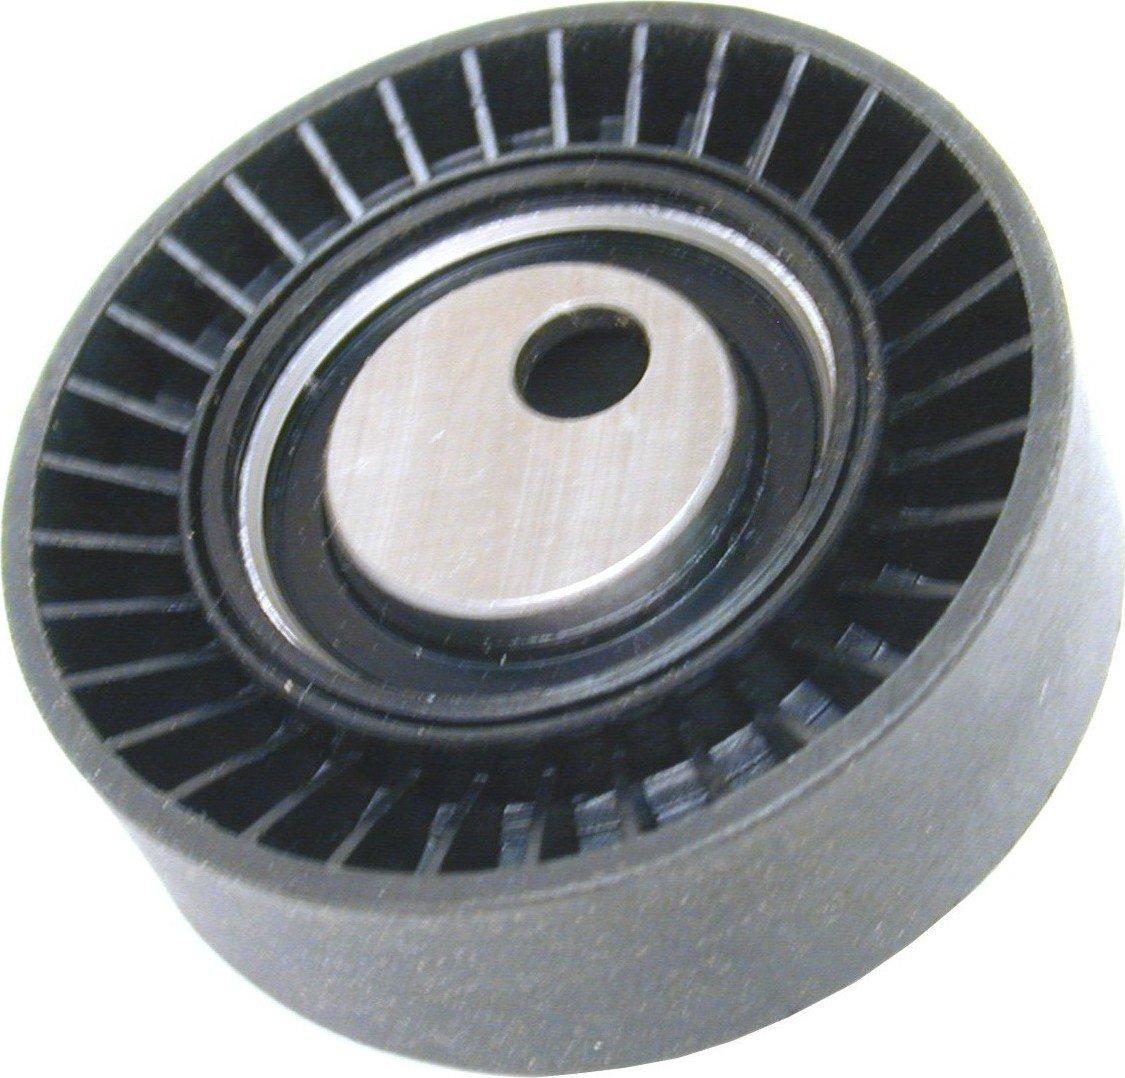 URO Parts 11 28 1 748 130 Belt Idler Pulley